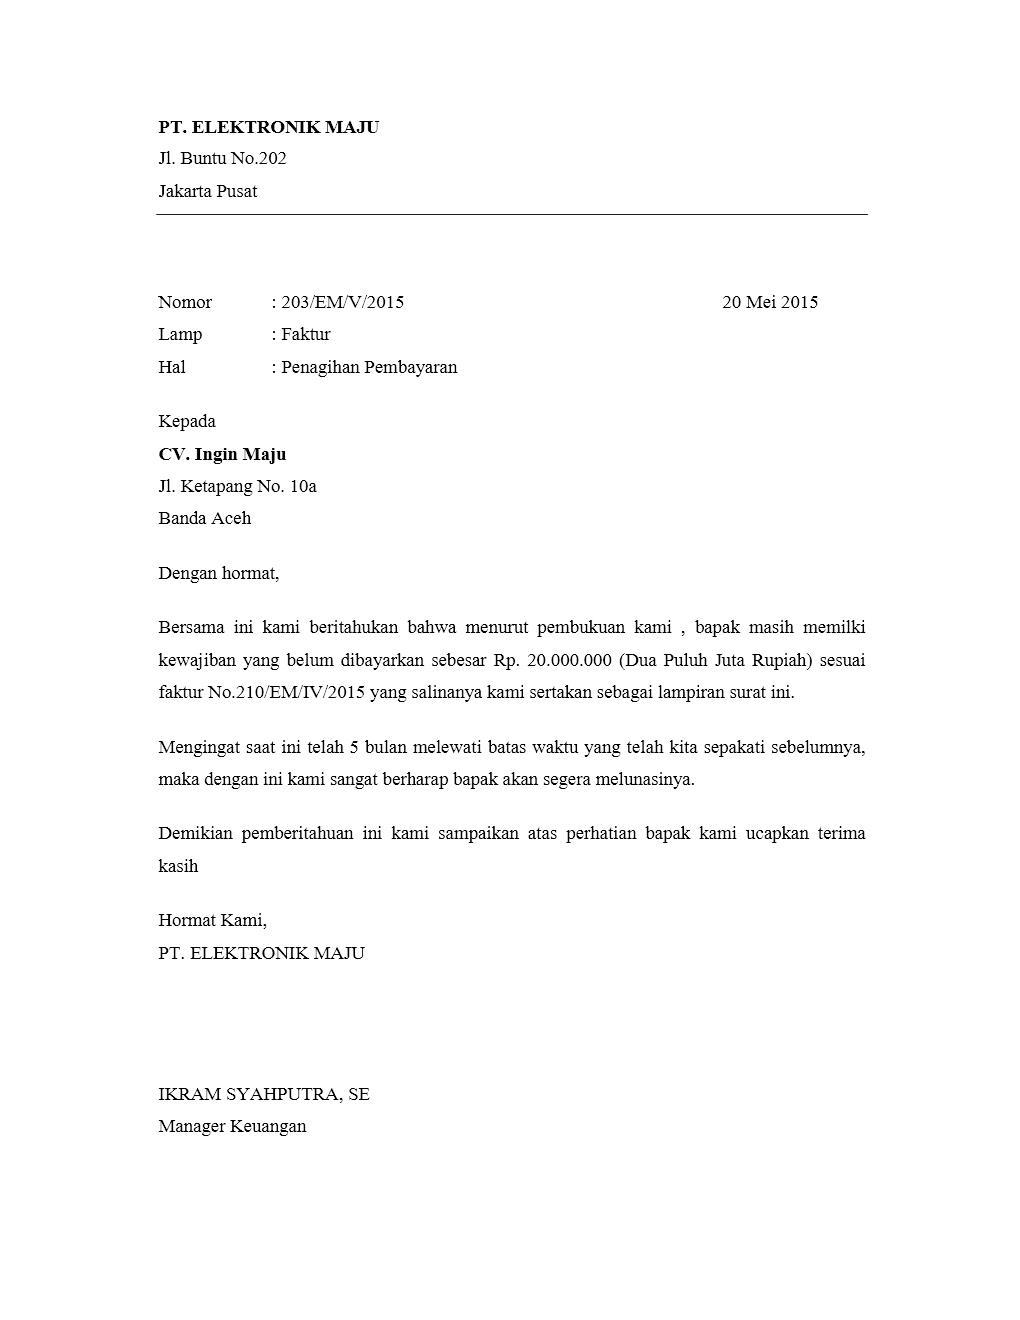 Contoh Surat Penagihan Pembayaran Barang - Assalam Print